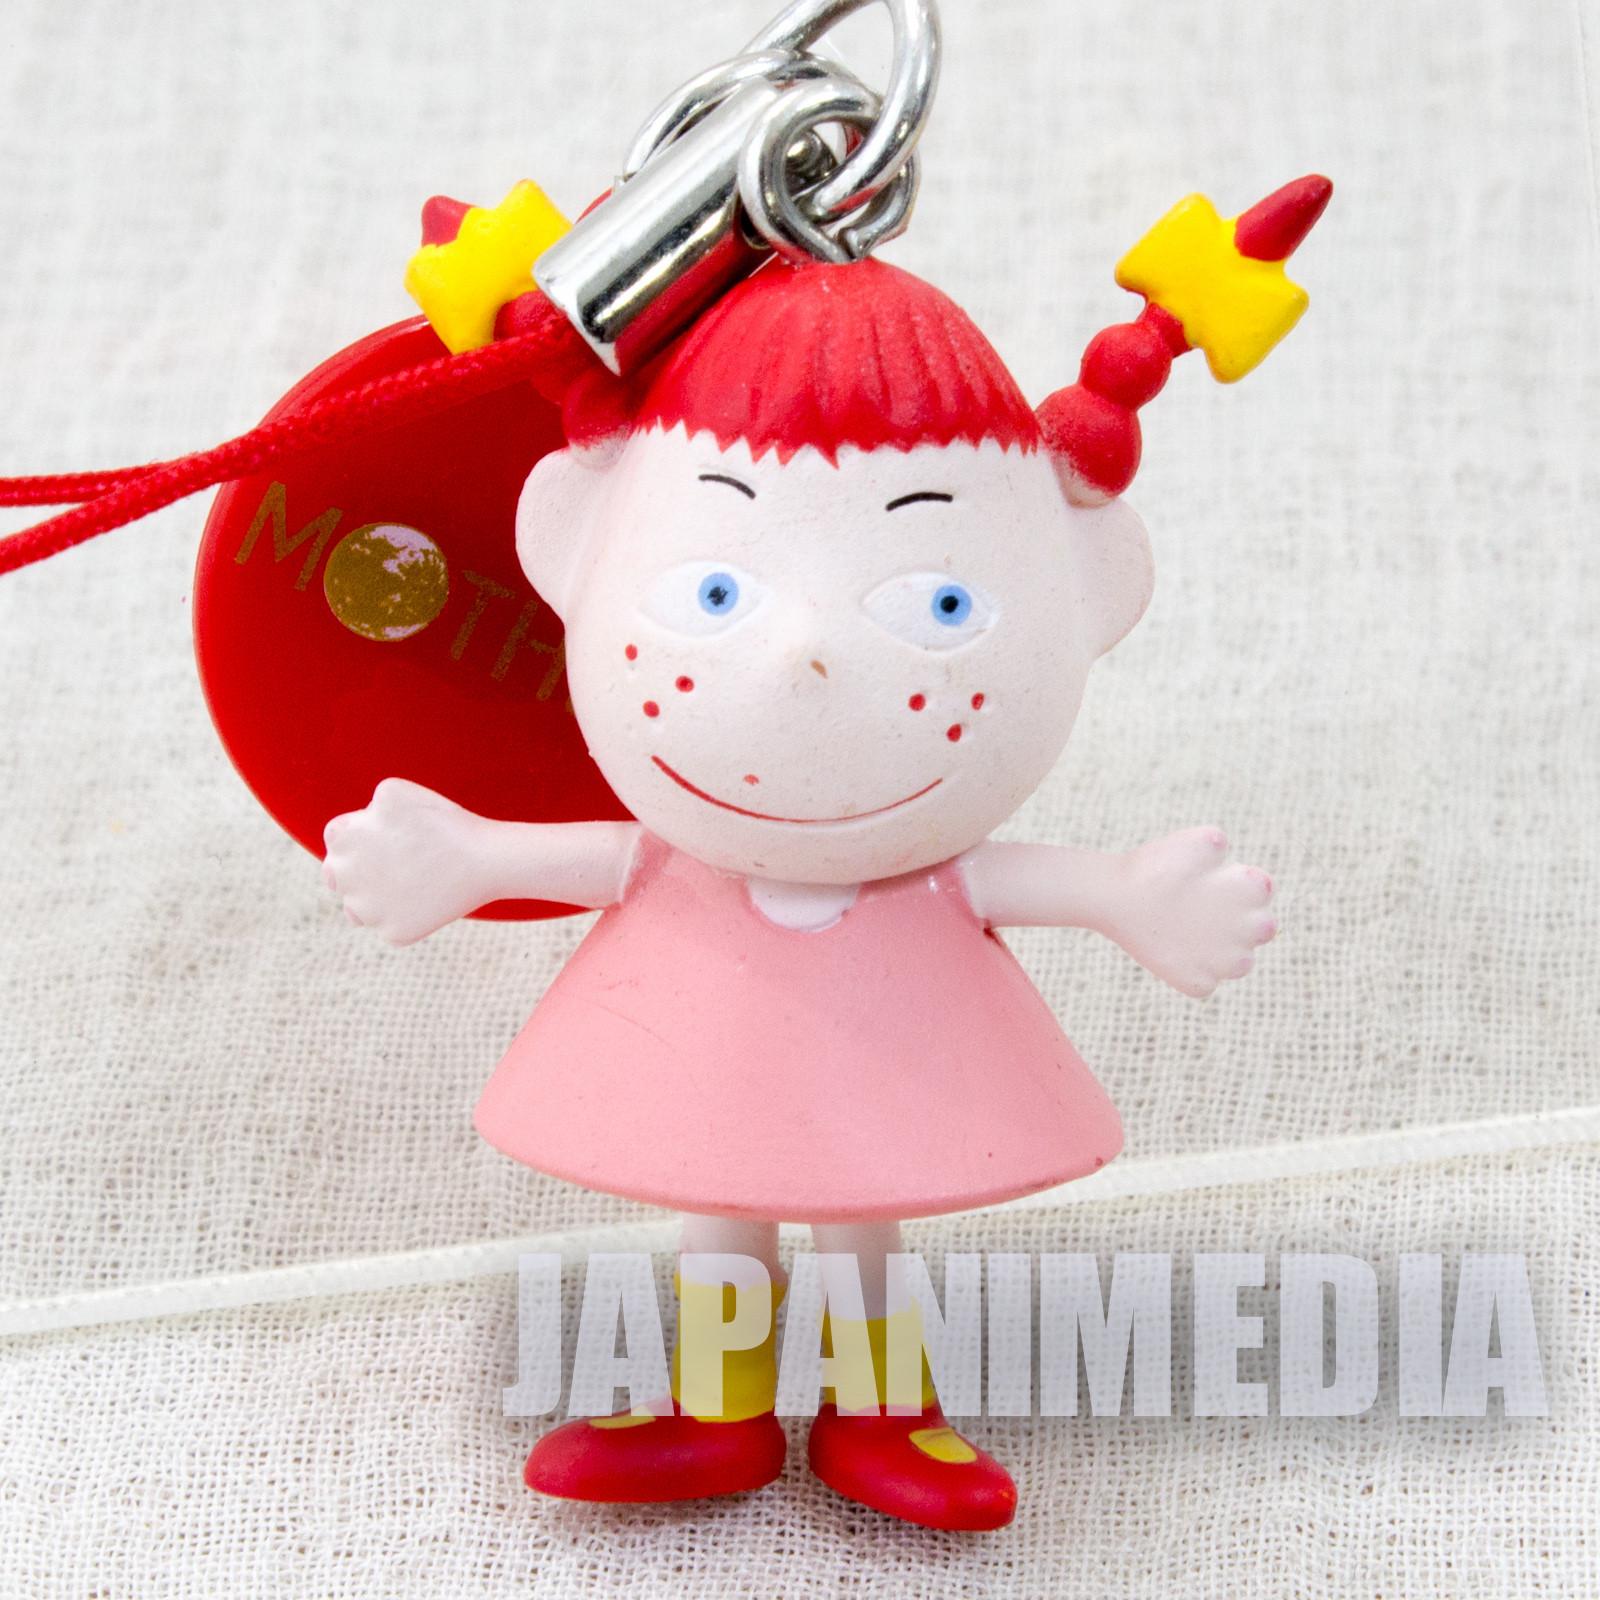 Mother Pippi Figure Strap Nintendo Takara Tomy JAPAN GAME NES FAMICOM